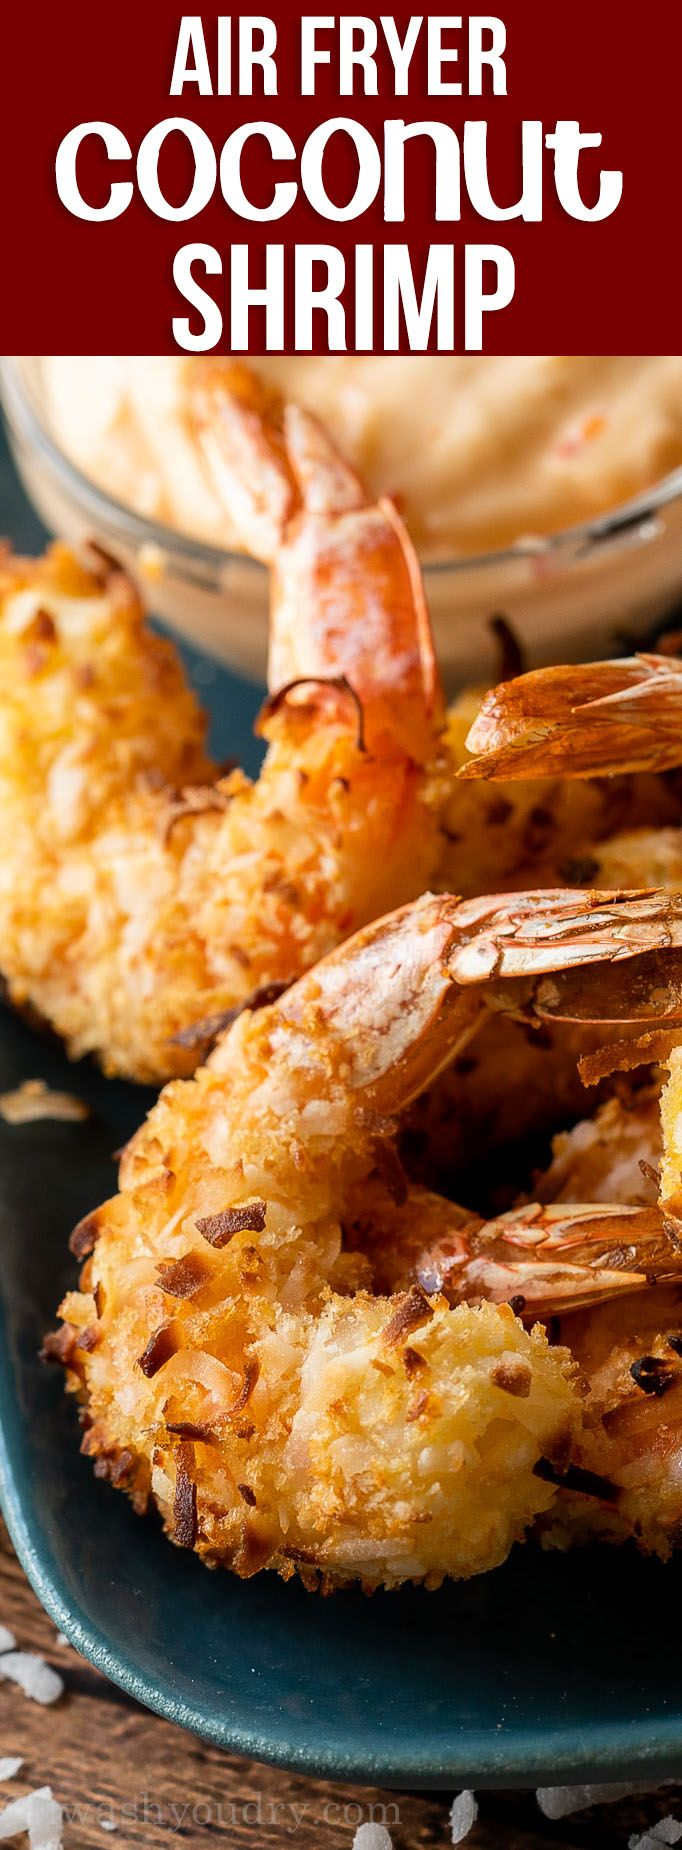 Photo of Air Fryer Coconut Shrimp Recipe